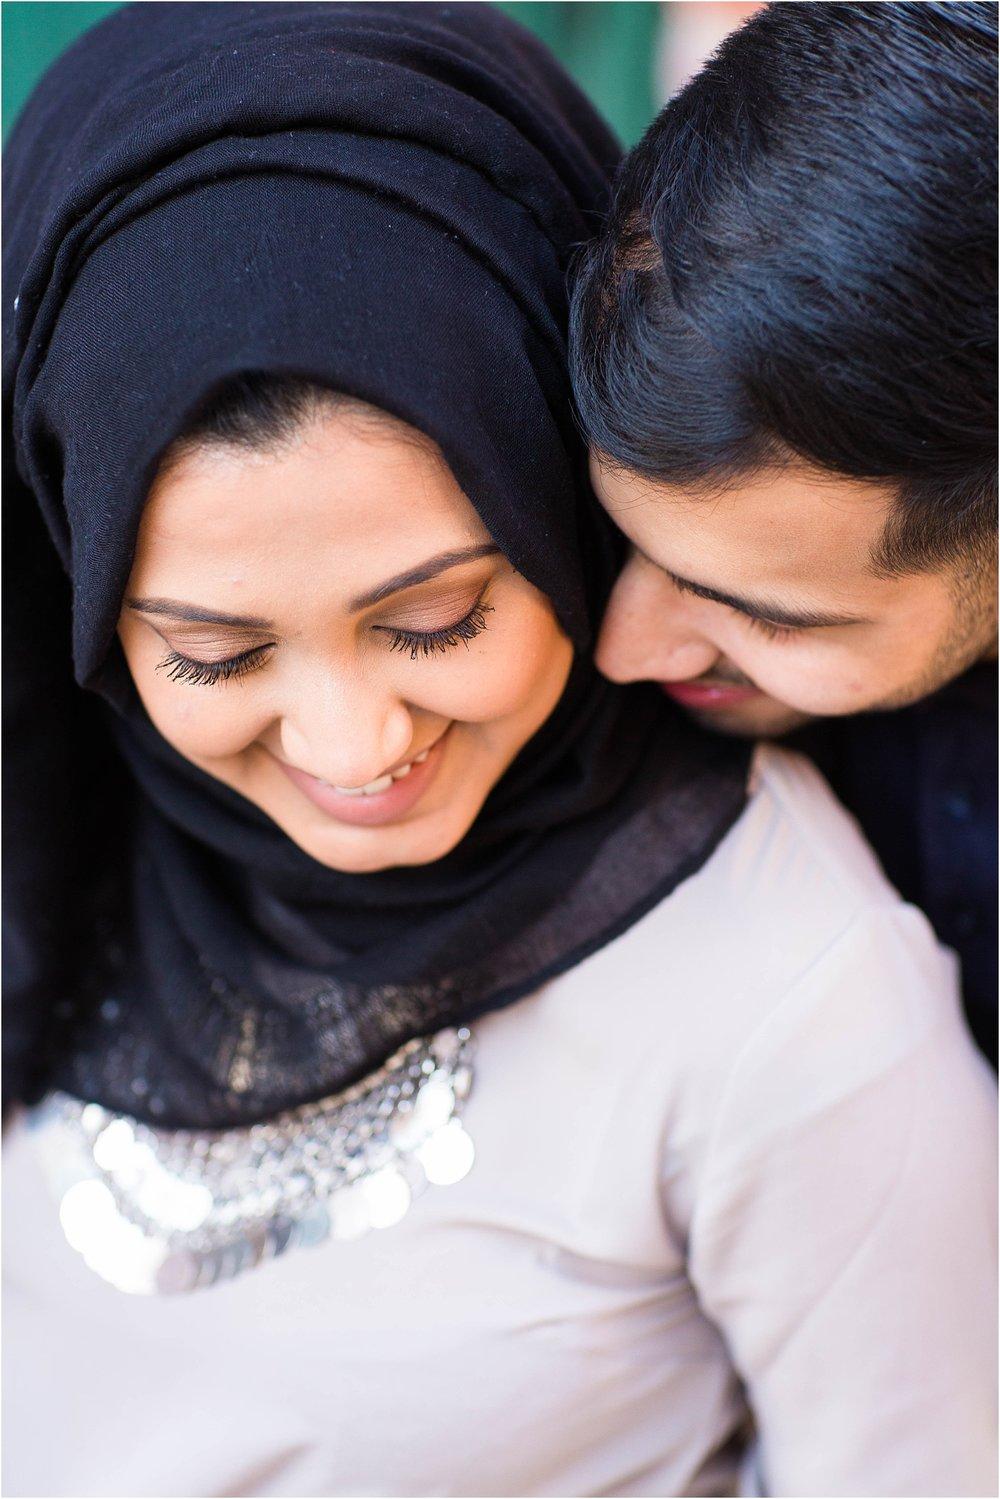 Distillery-District-Humber-Bay-Park-Engagement-Toronto-Mississauga-Brampton-Scarborough-GTA-Pakistani-Indian-Wedding-Engagement-Photographer-Photography_0009.jpg